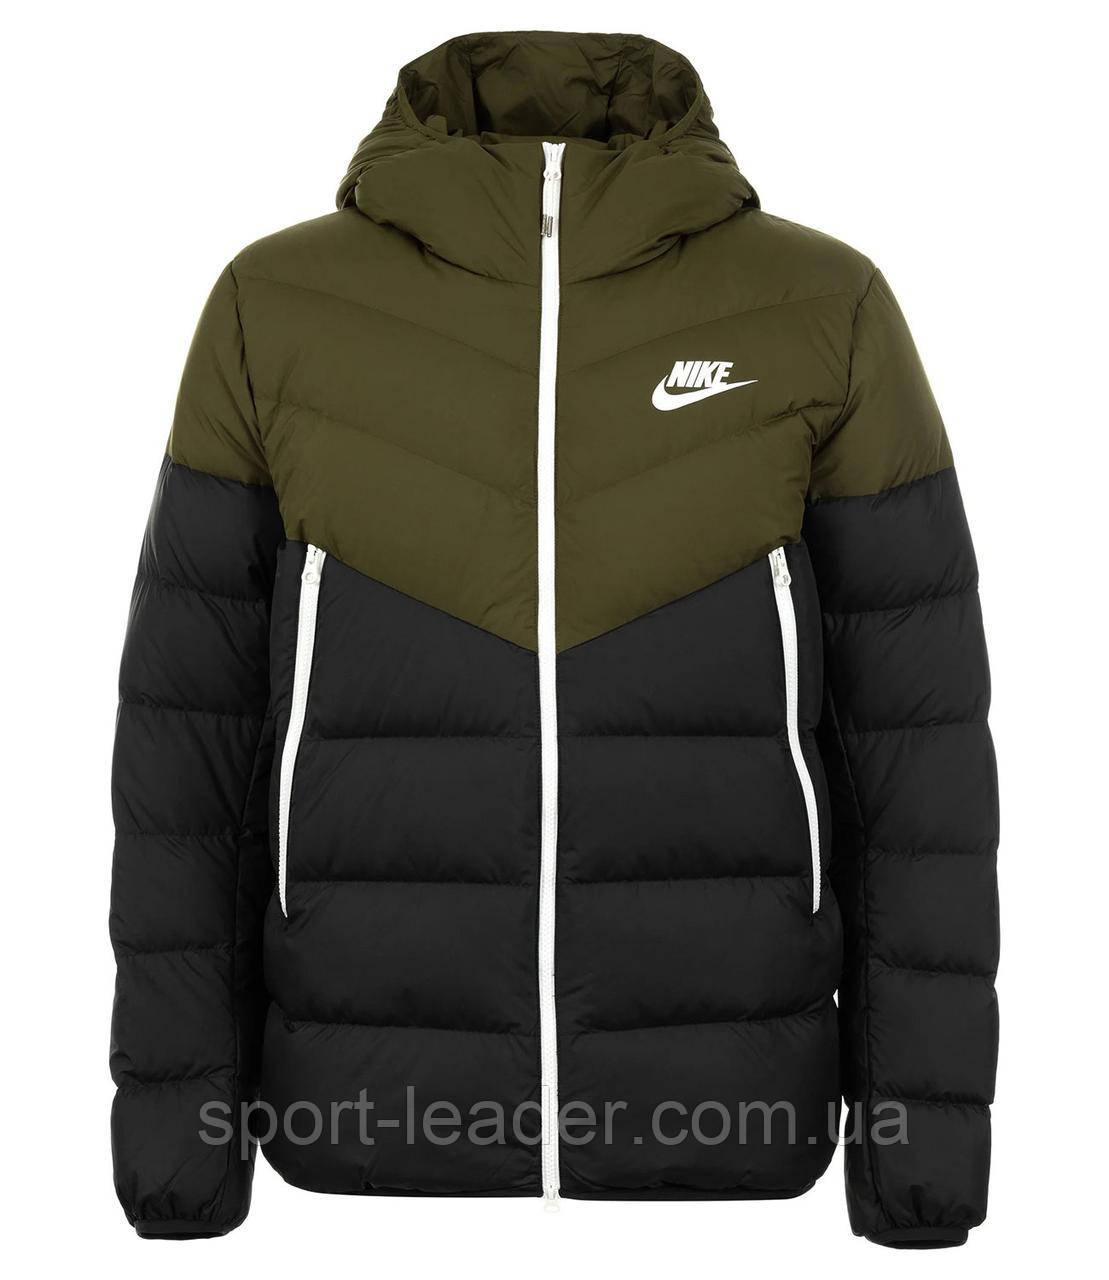 be6019dd Мужской пуховик Nike M Nsw Dwn Fill Wr Jkt Hd Rus AO8911-395, цена 4 ...